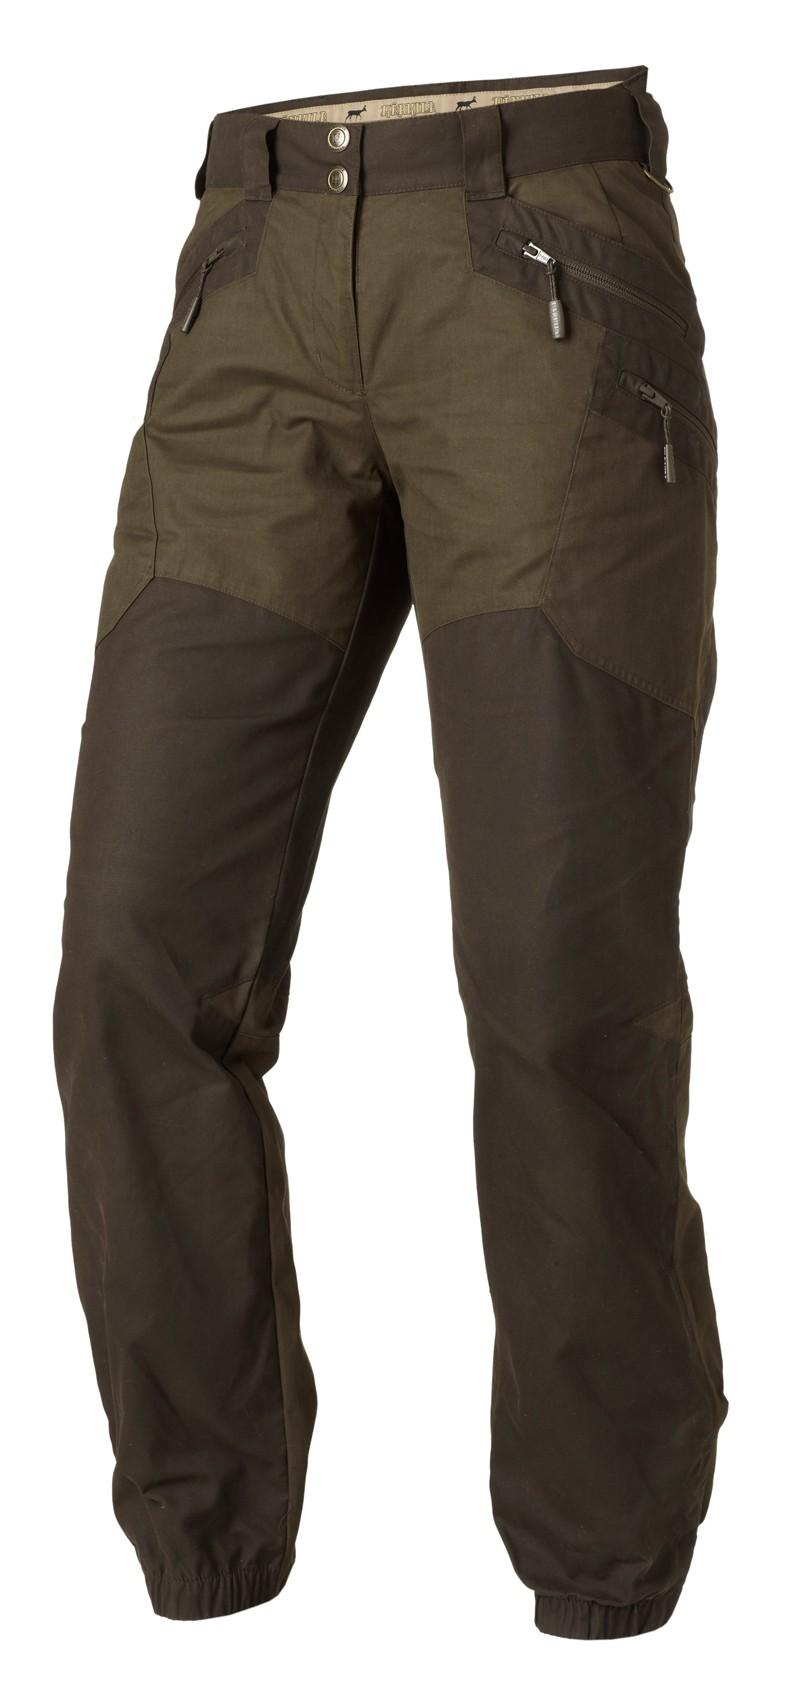 Pantalon pour femme Mountain Trek Härkila